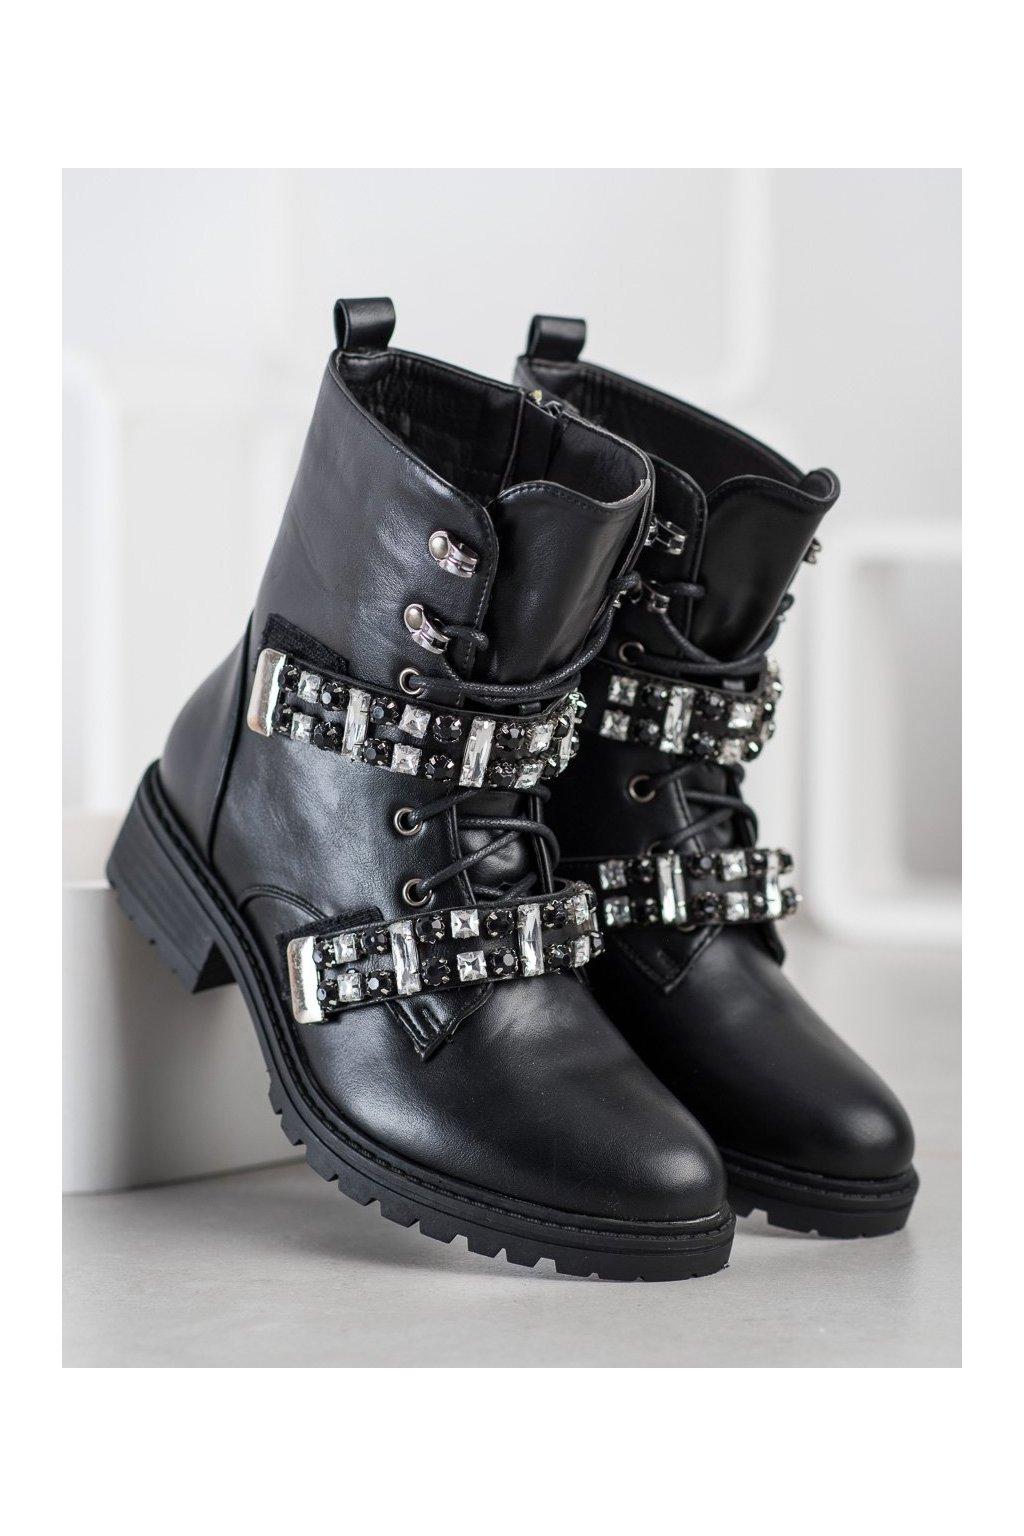 Čierne dámske topánky Seastar kod NC890B